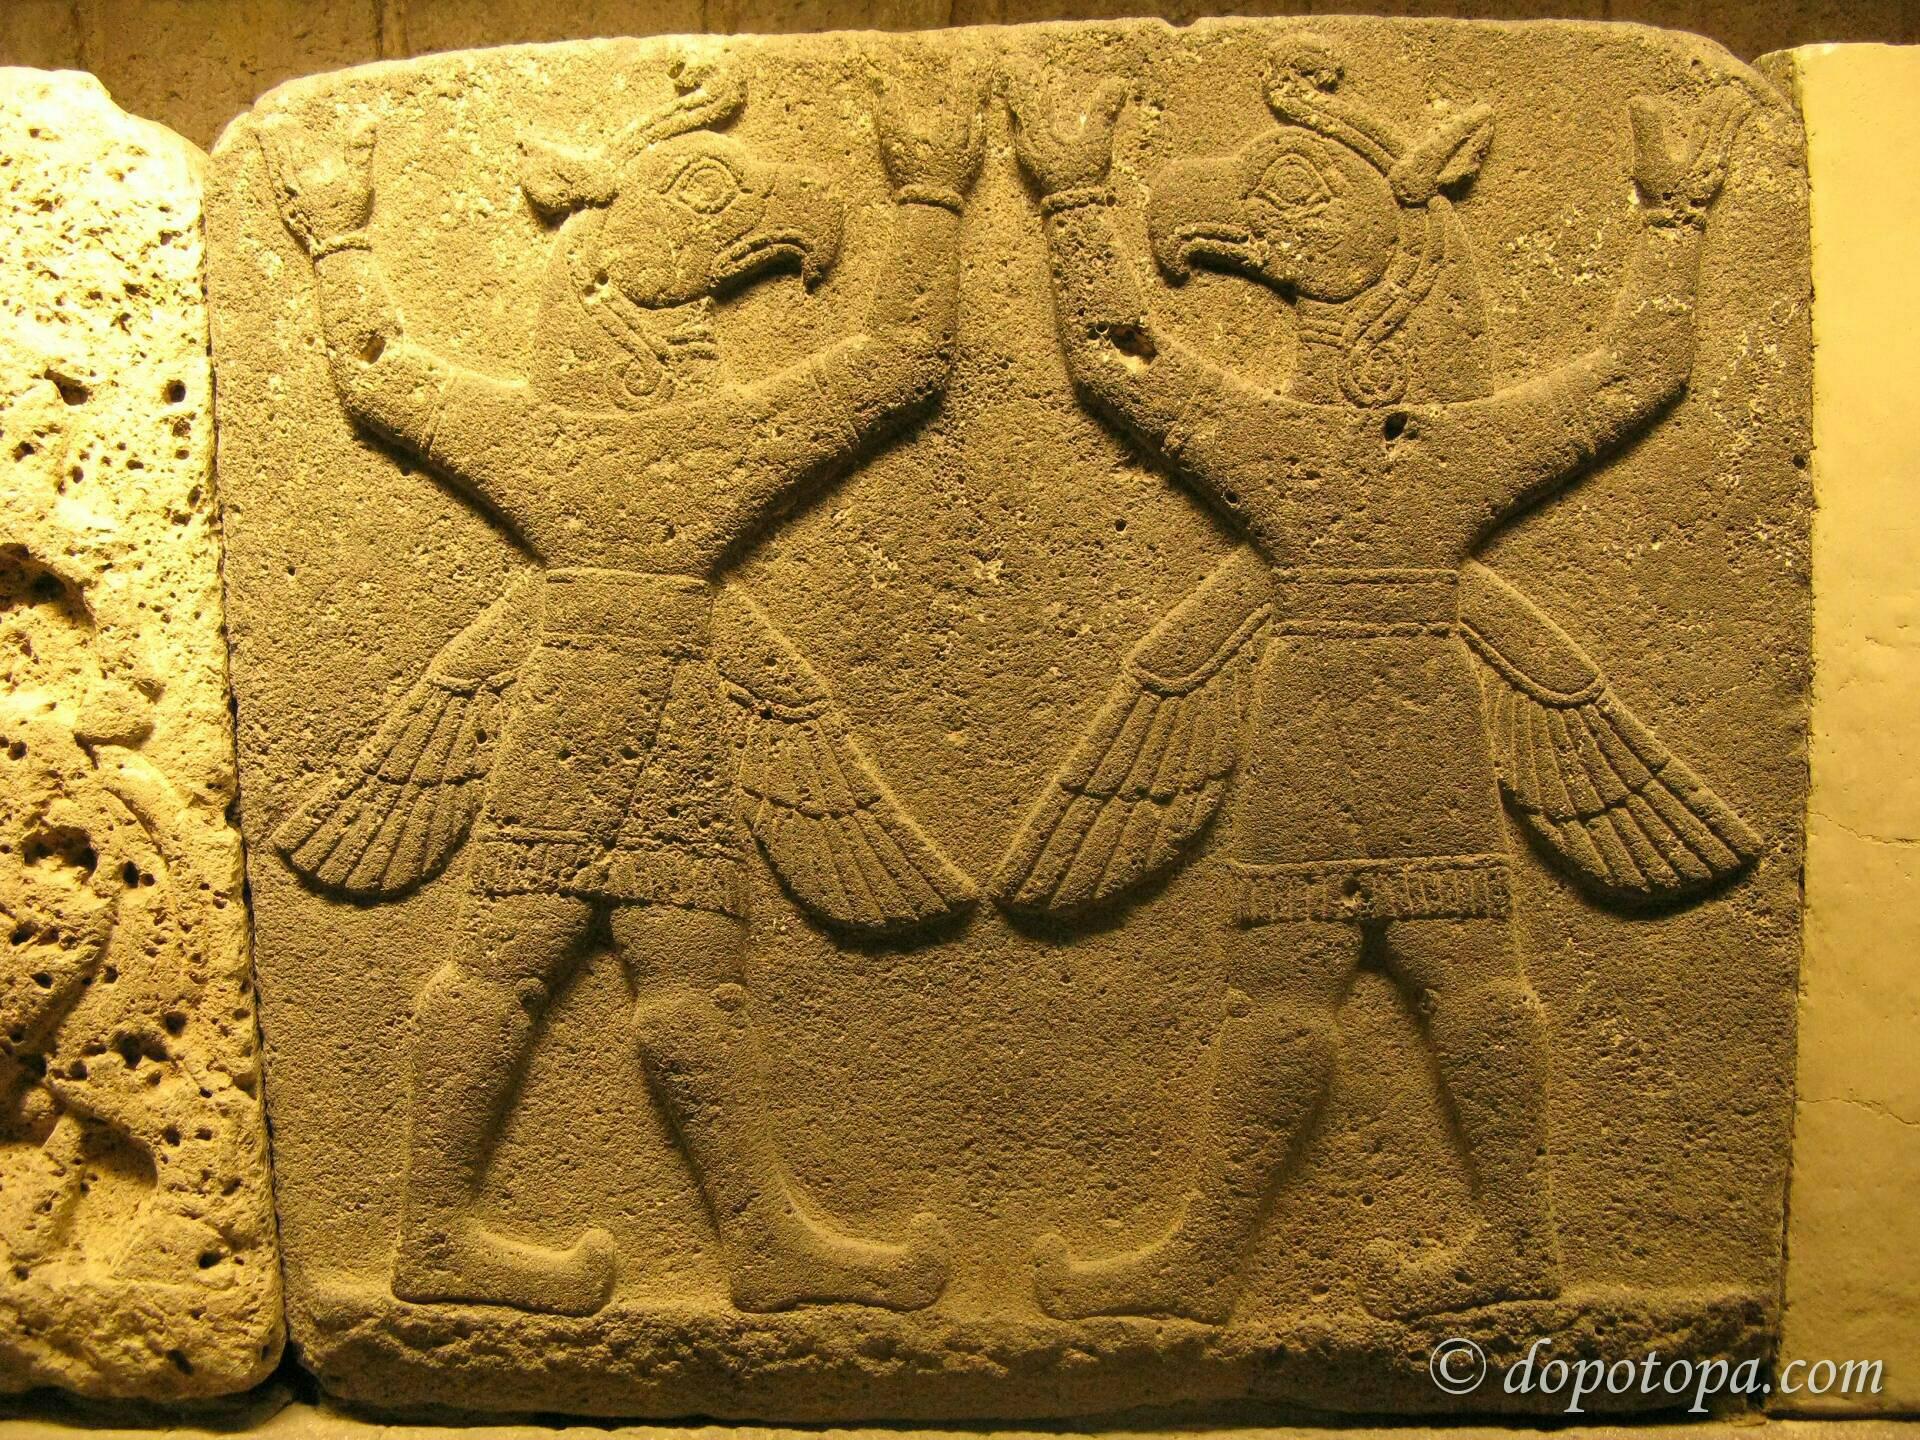 ankara_museum_stone_artefacts_15.JPG